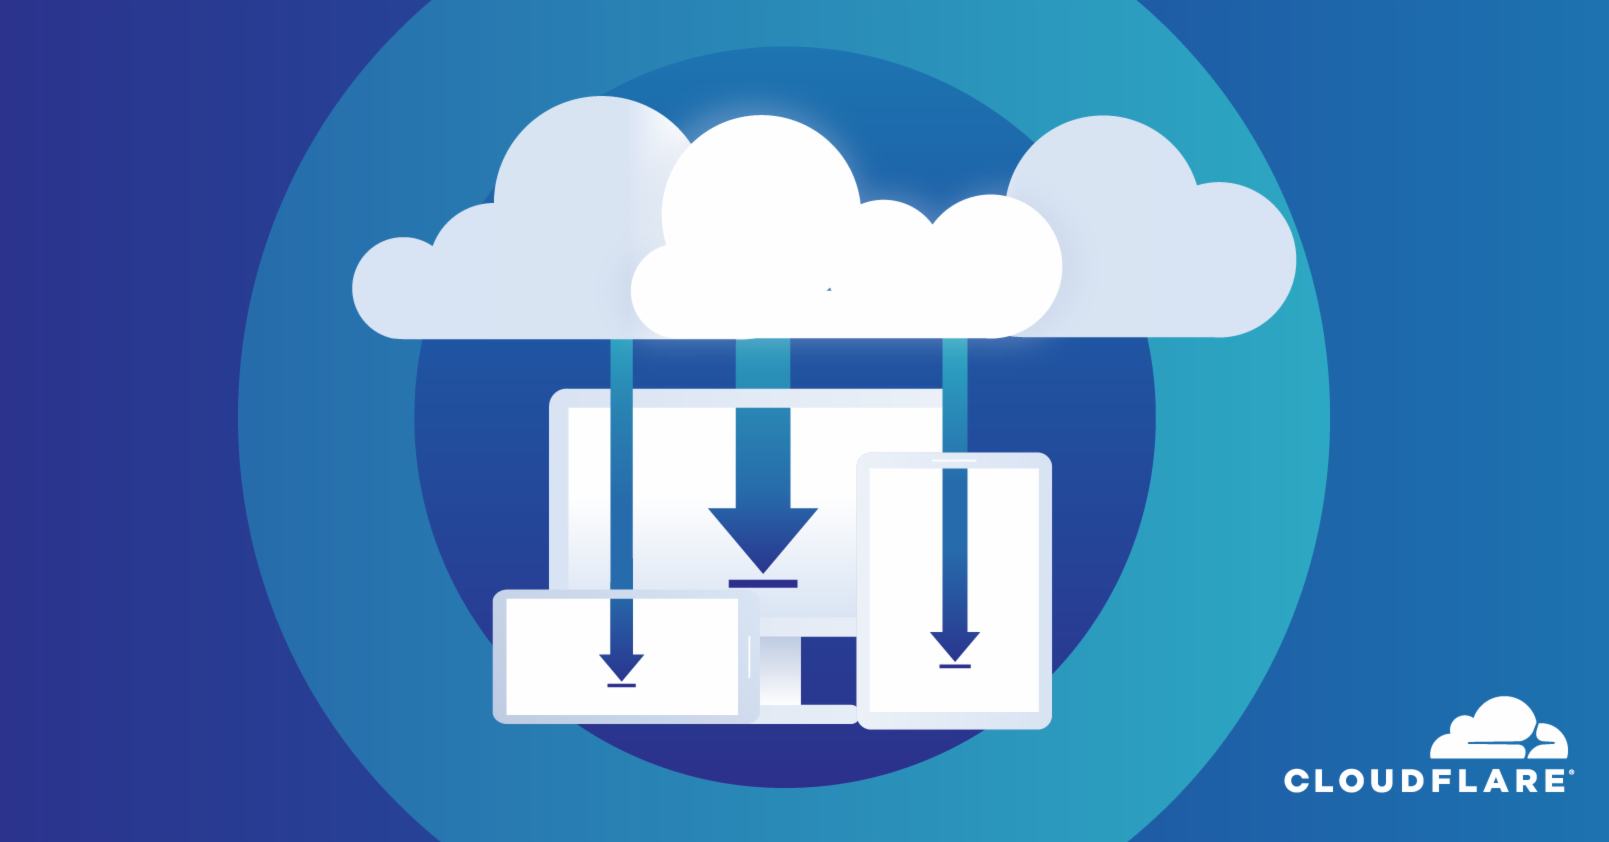 blog-cloudflare-com.cdn.ampproject.org